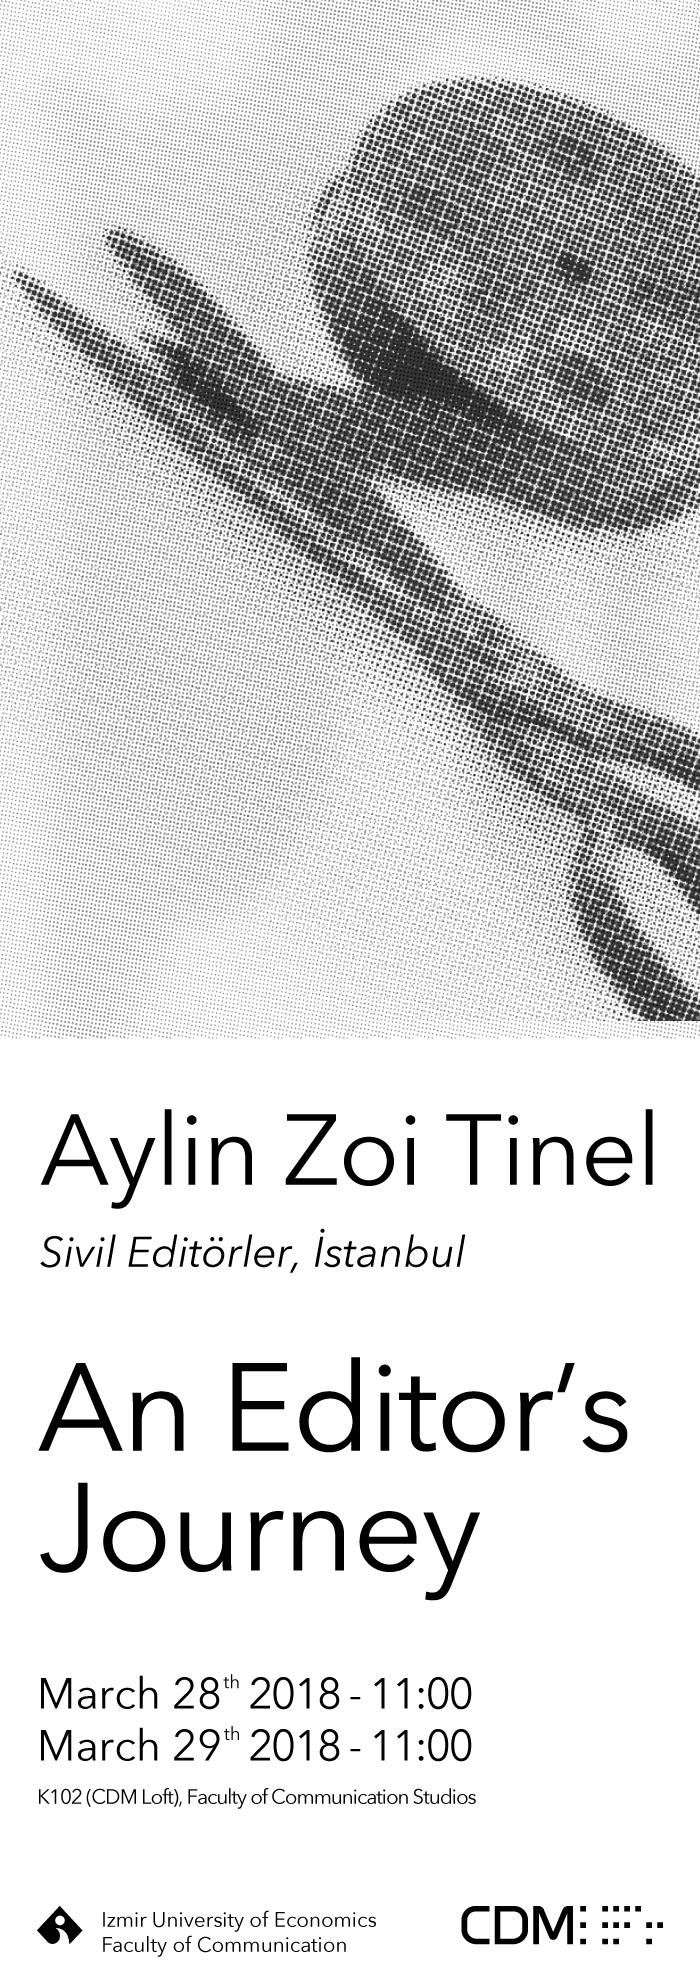 Artist's Talk: Aylin Zoi Tinel